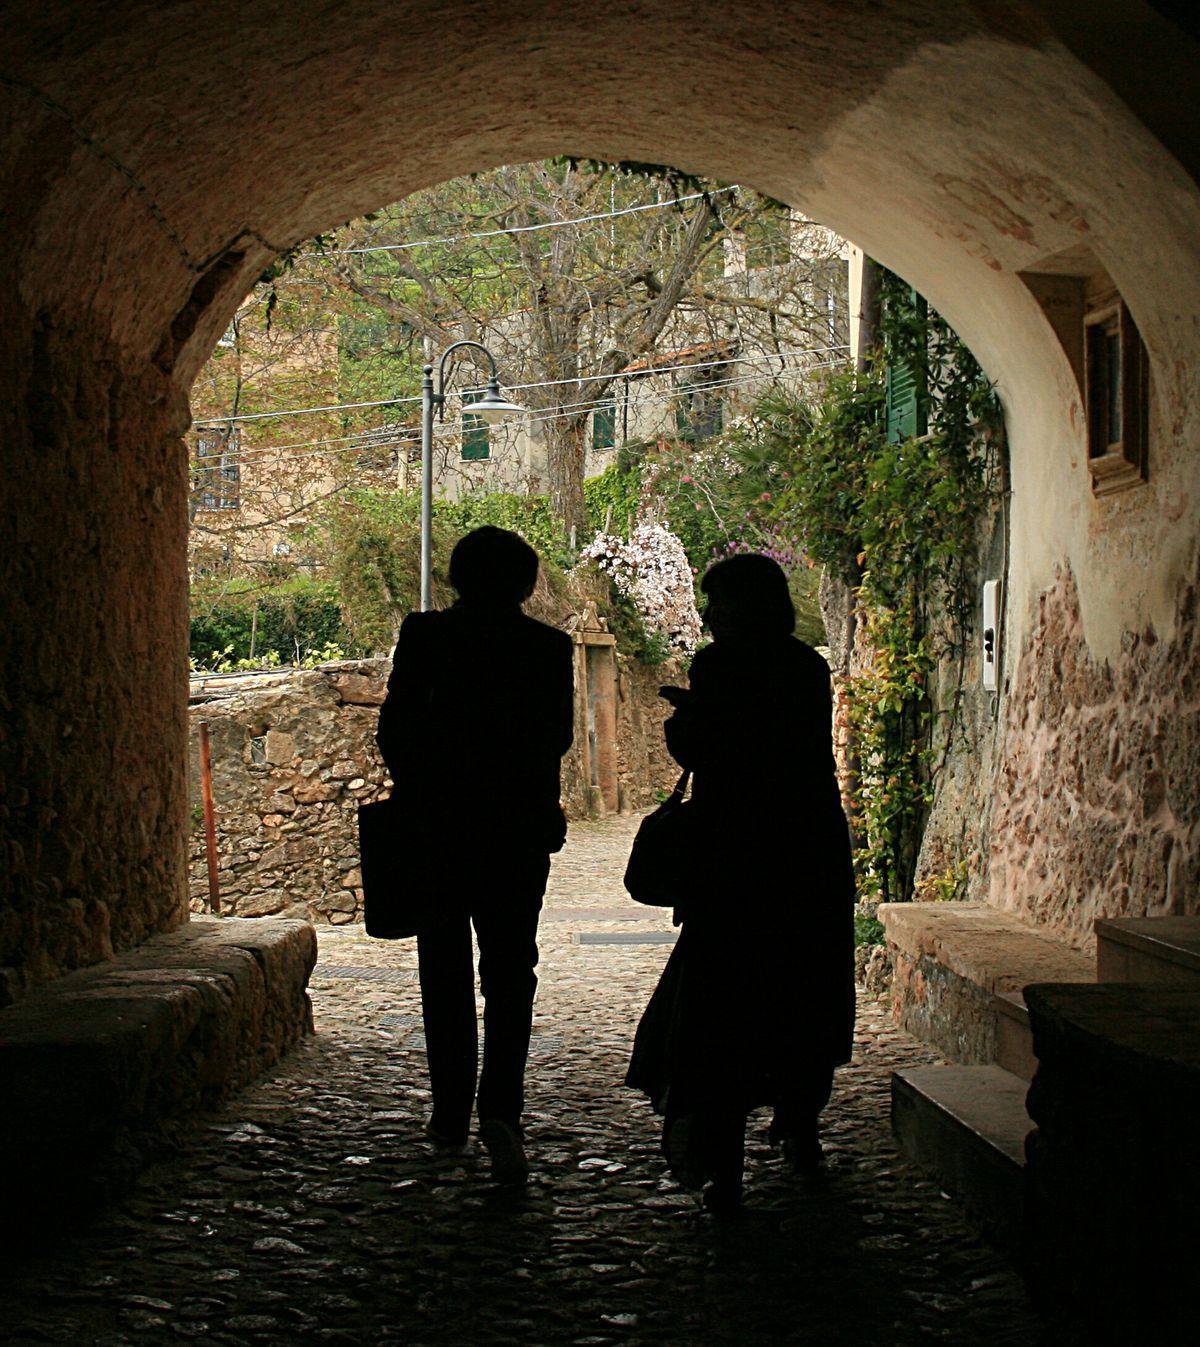 Verezzi Contrast Light And Shadow Walking Around Memories Friends Likeadream Getting Inspired